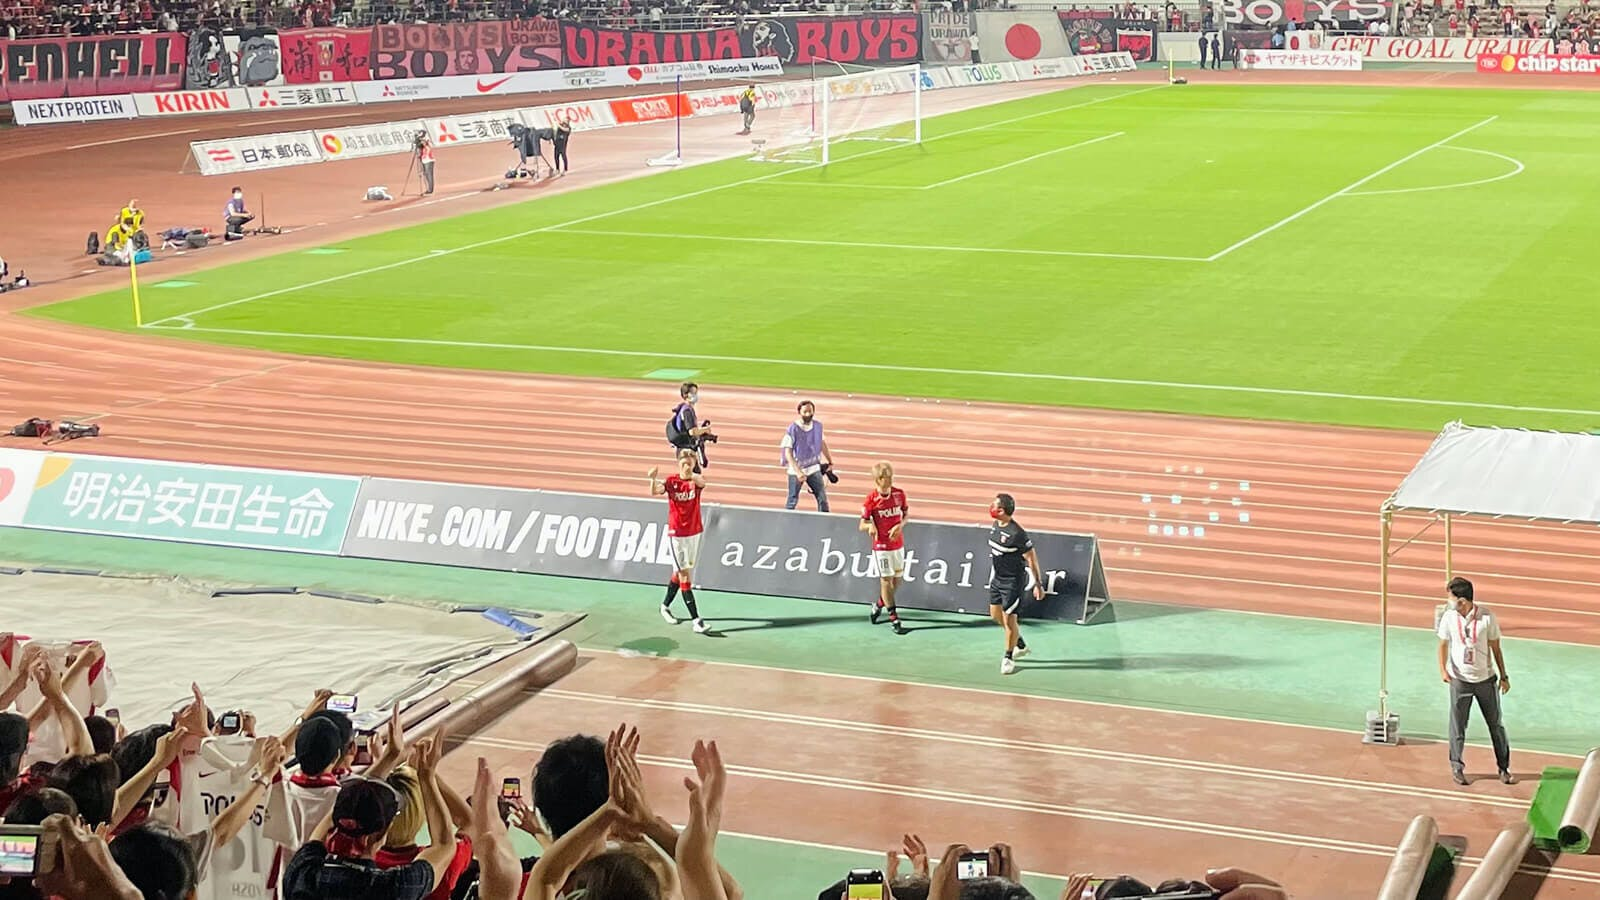 2021 Jリーグ YBC ルヴァンカップ プレーオフステージ 第2戦 浦和駒場スタジアム ヴィッセル神戸戦 試合終了後の様子